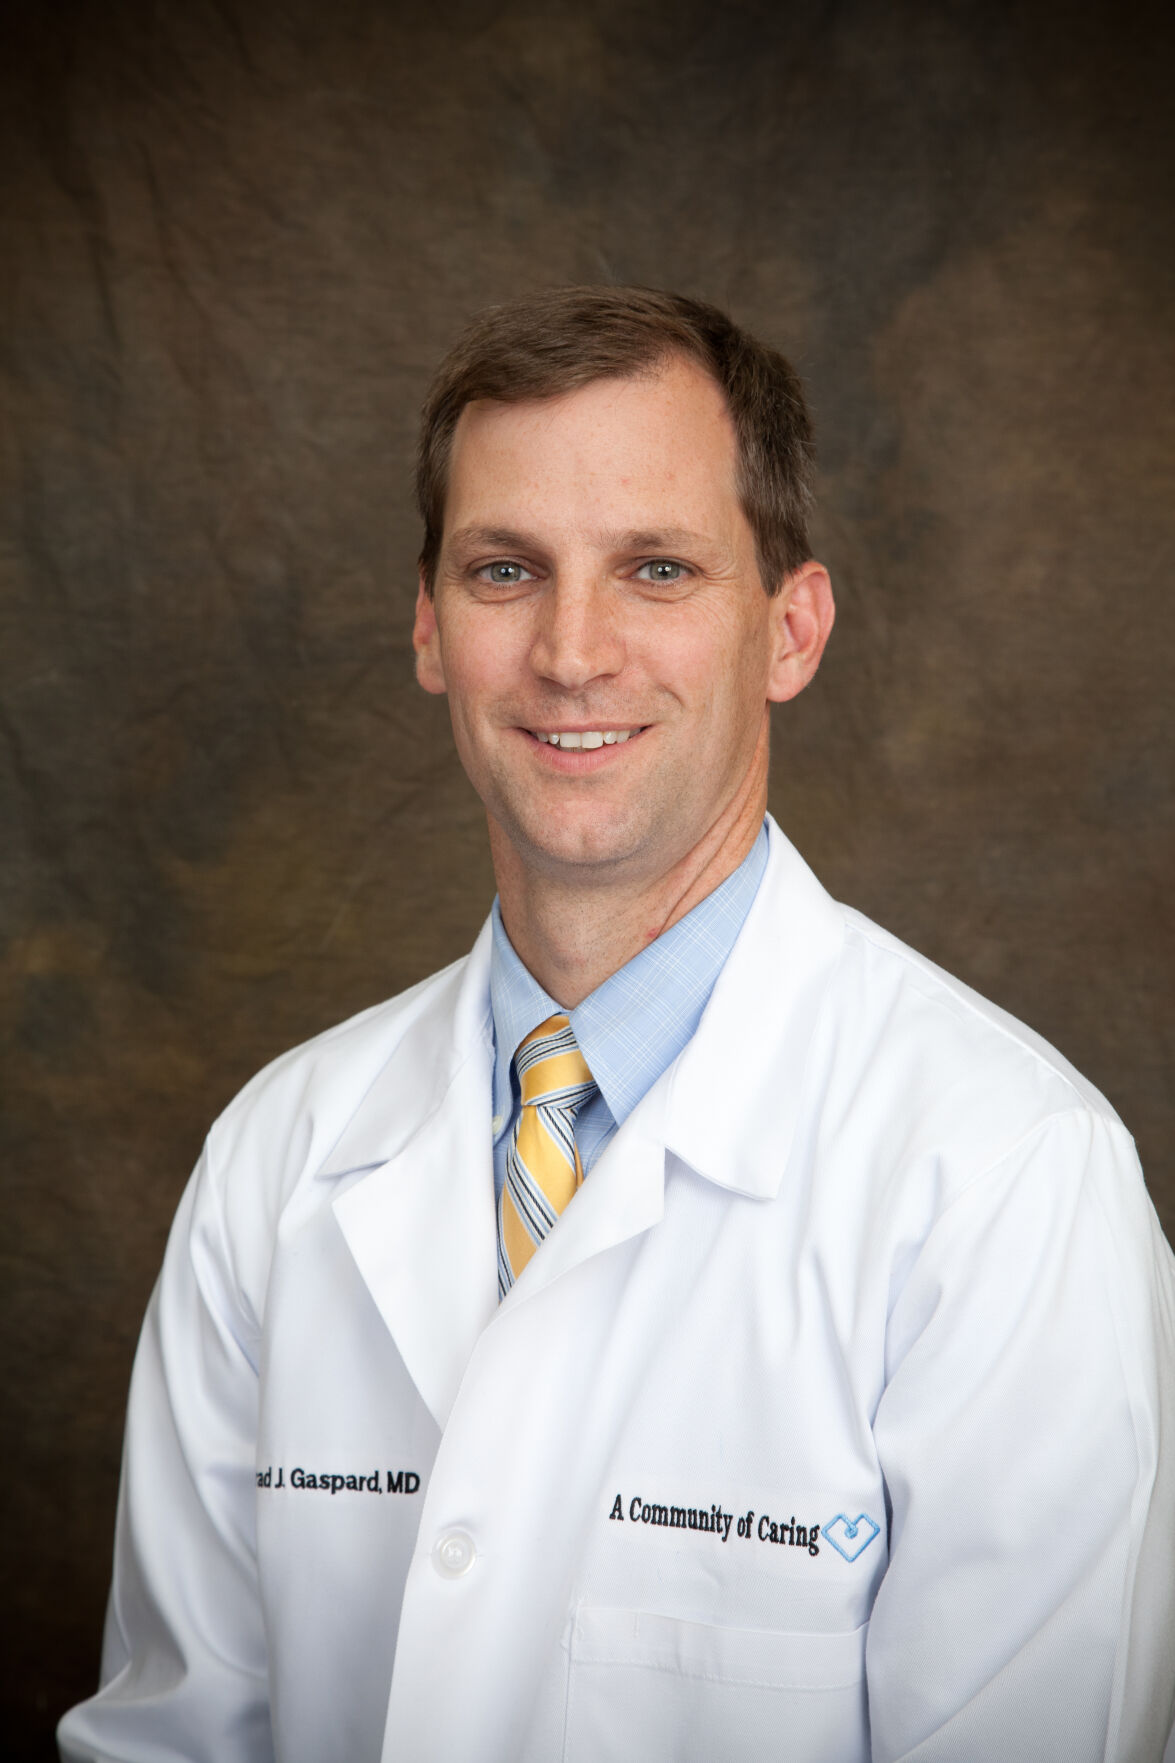 Dr. Brad J. Gaspard_07.jpg